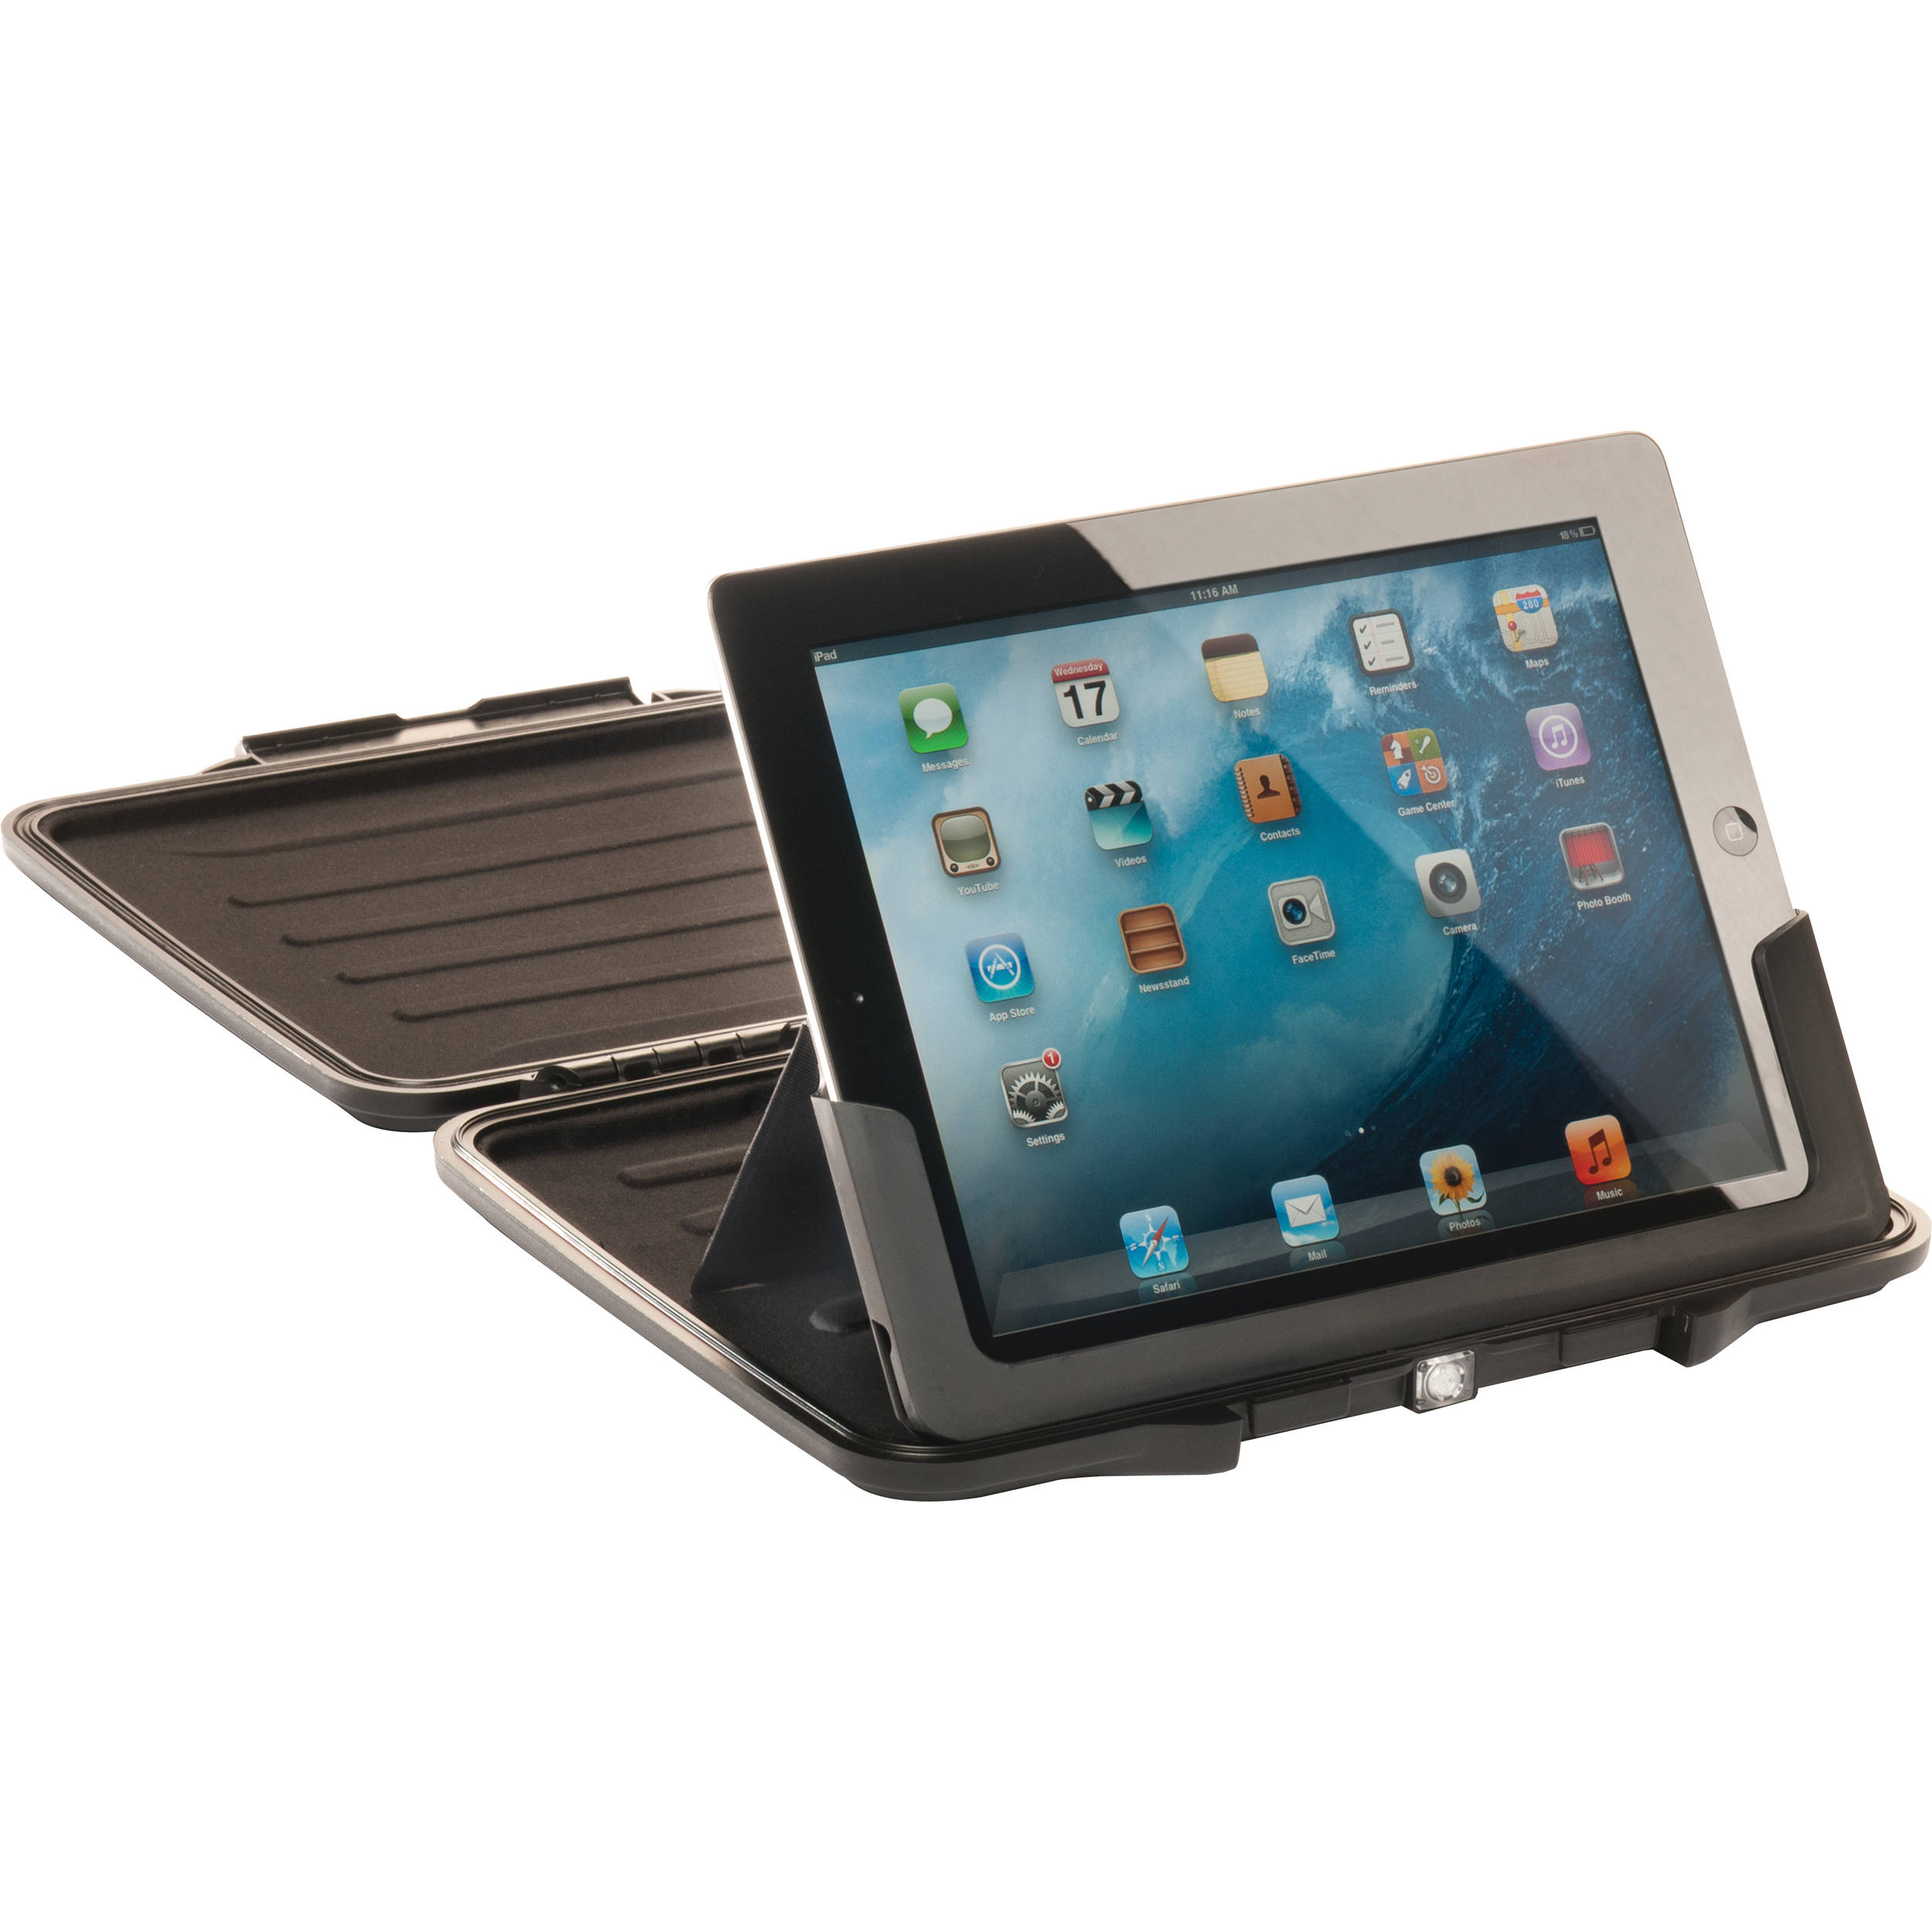 pelican progear i1065 hardback case 1065 005 110 b h photo video. Black Bedroom Furniture Sets. Home Design Ideas